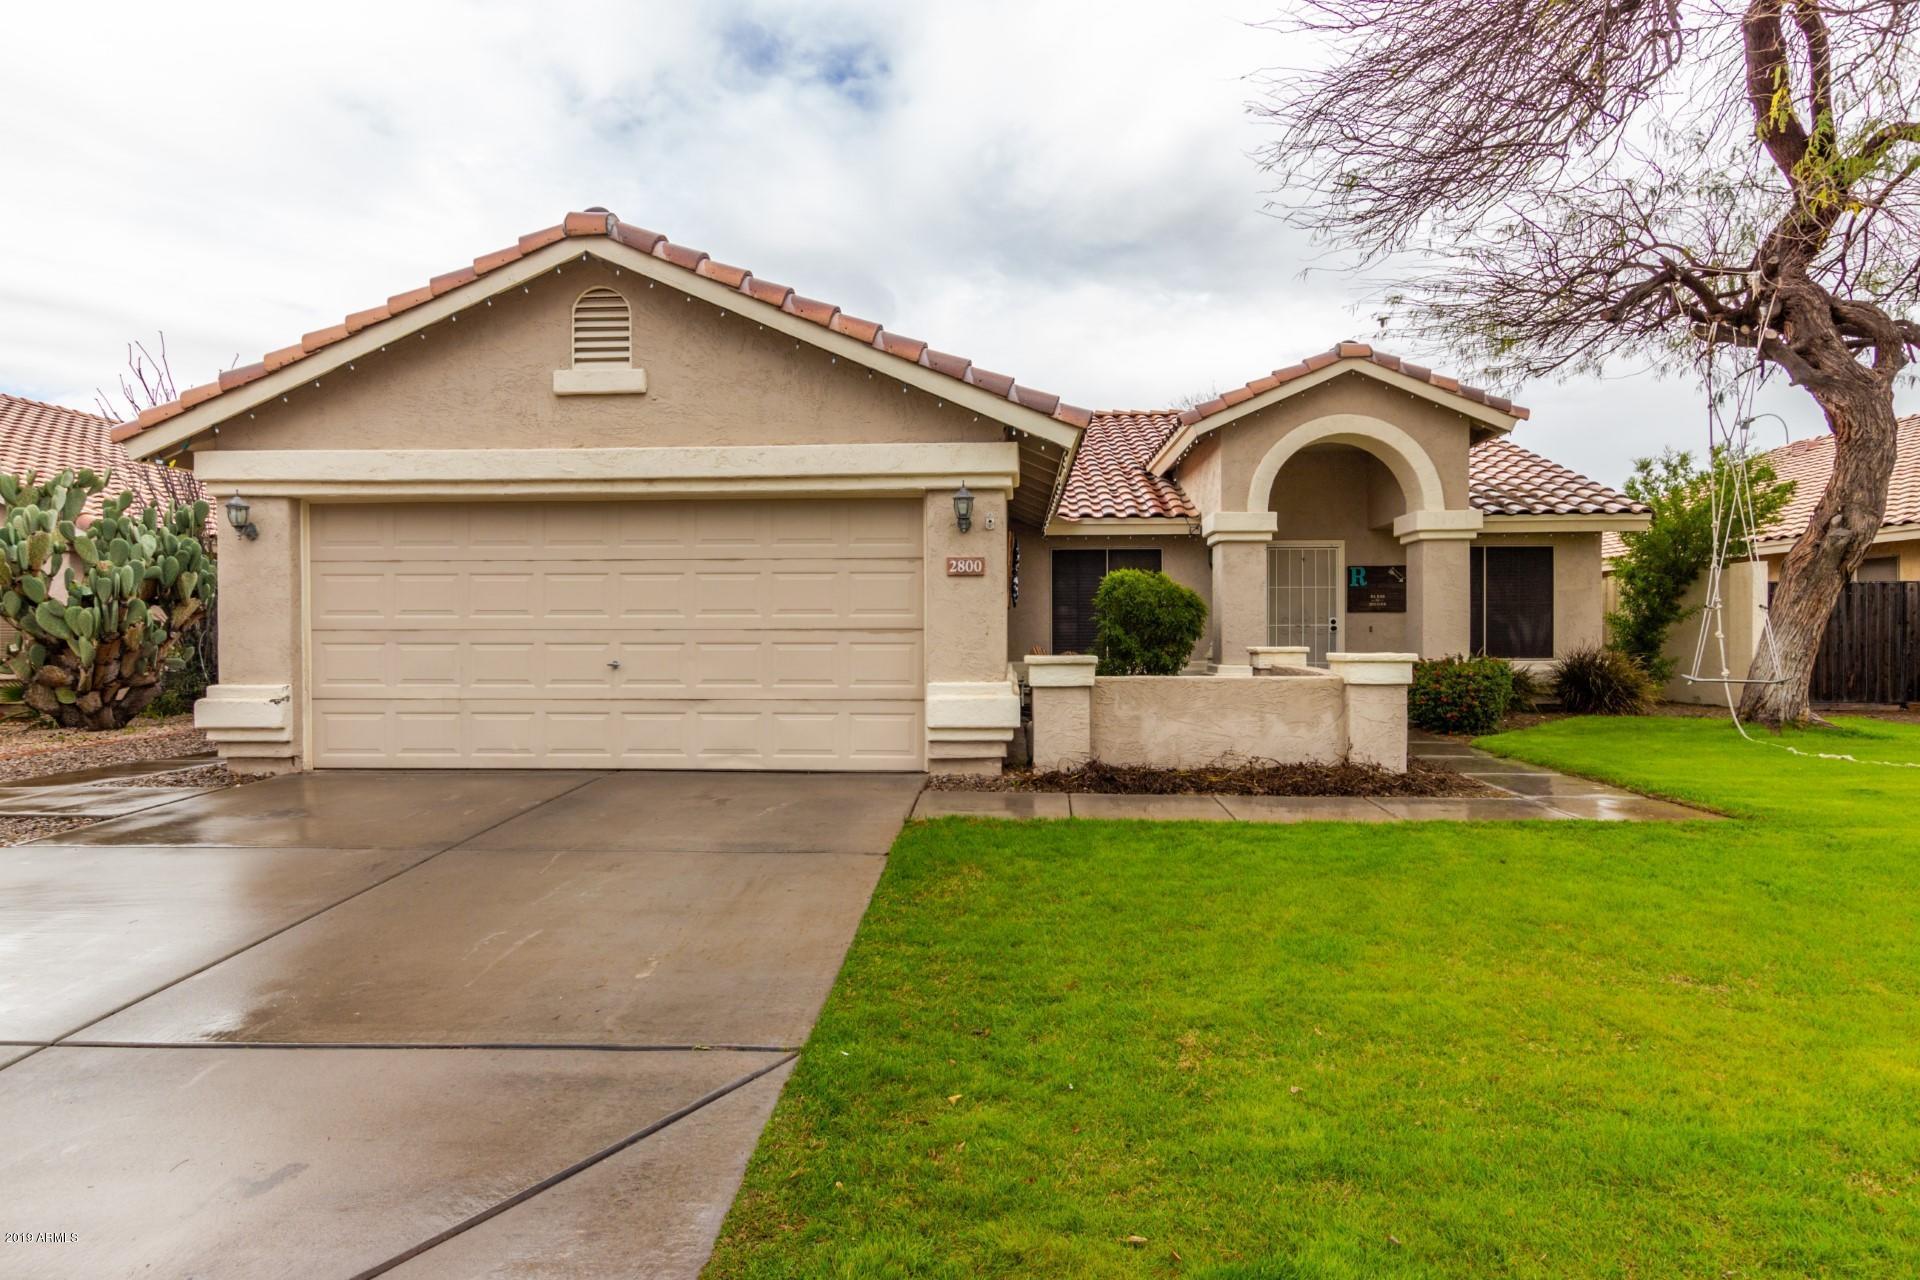 Photo of 2800 S LOS ALTOS Place, Chandler, AZ 85286